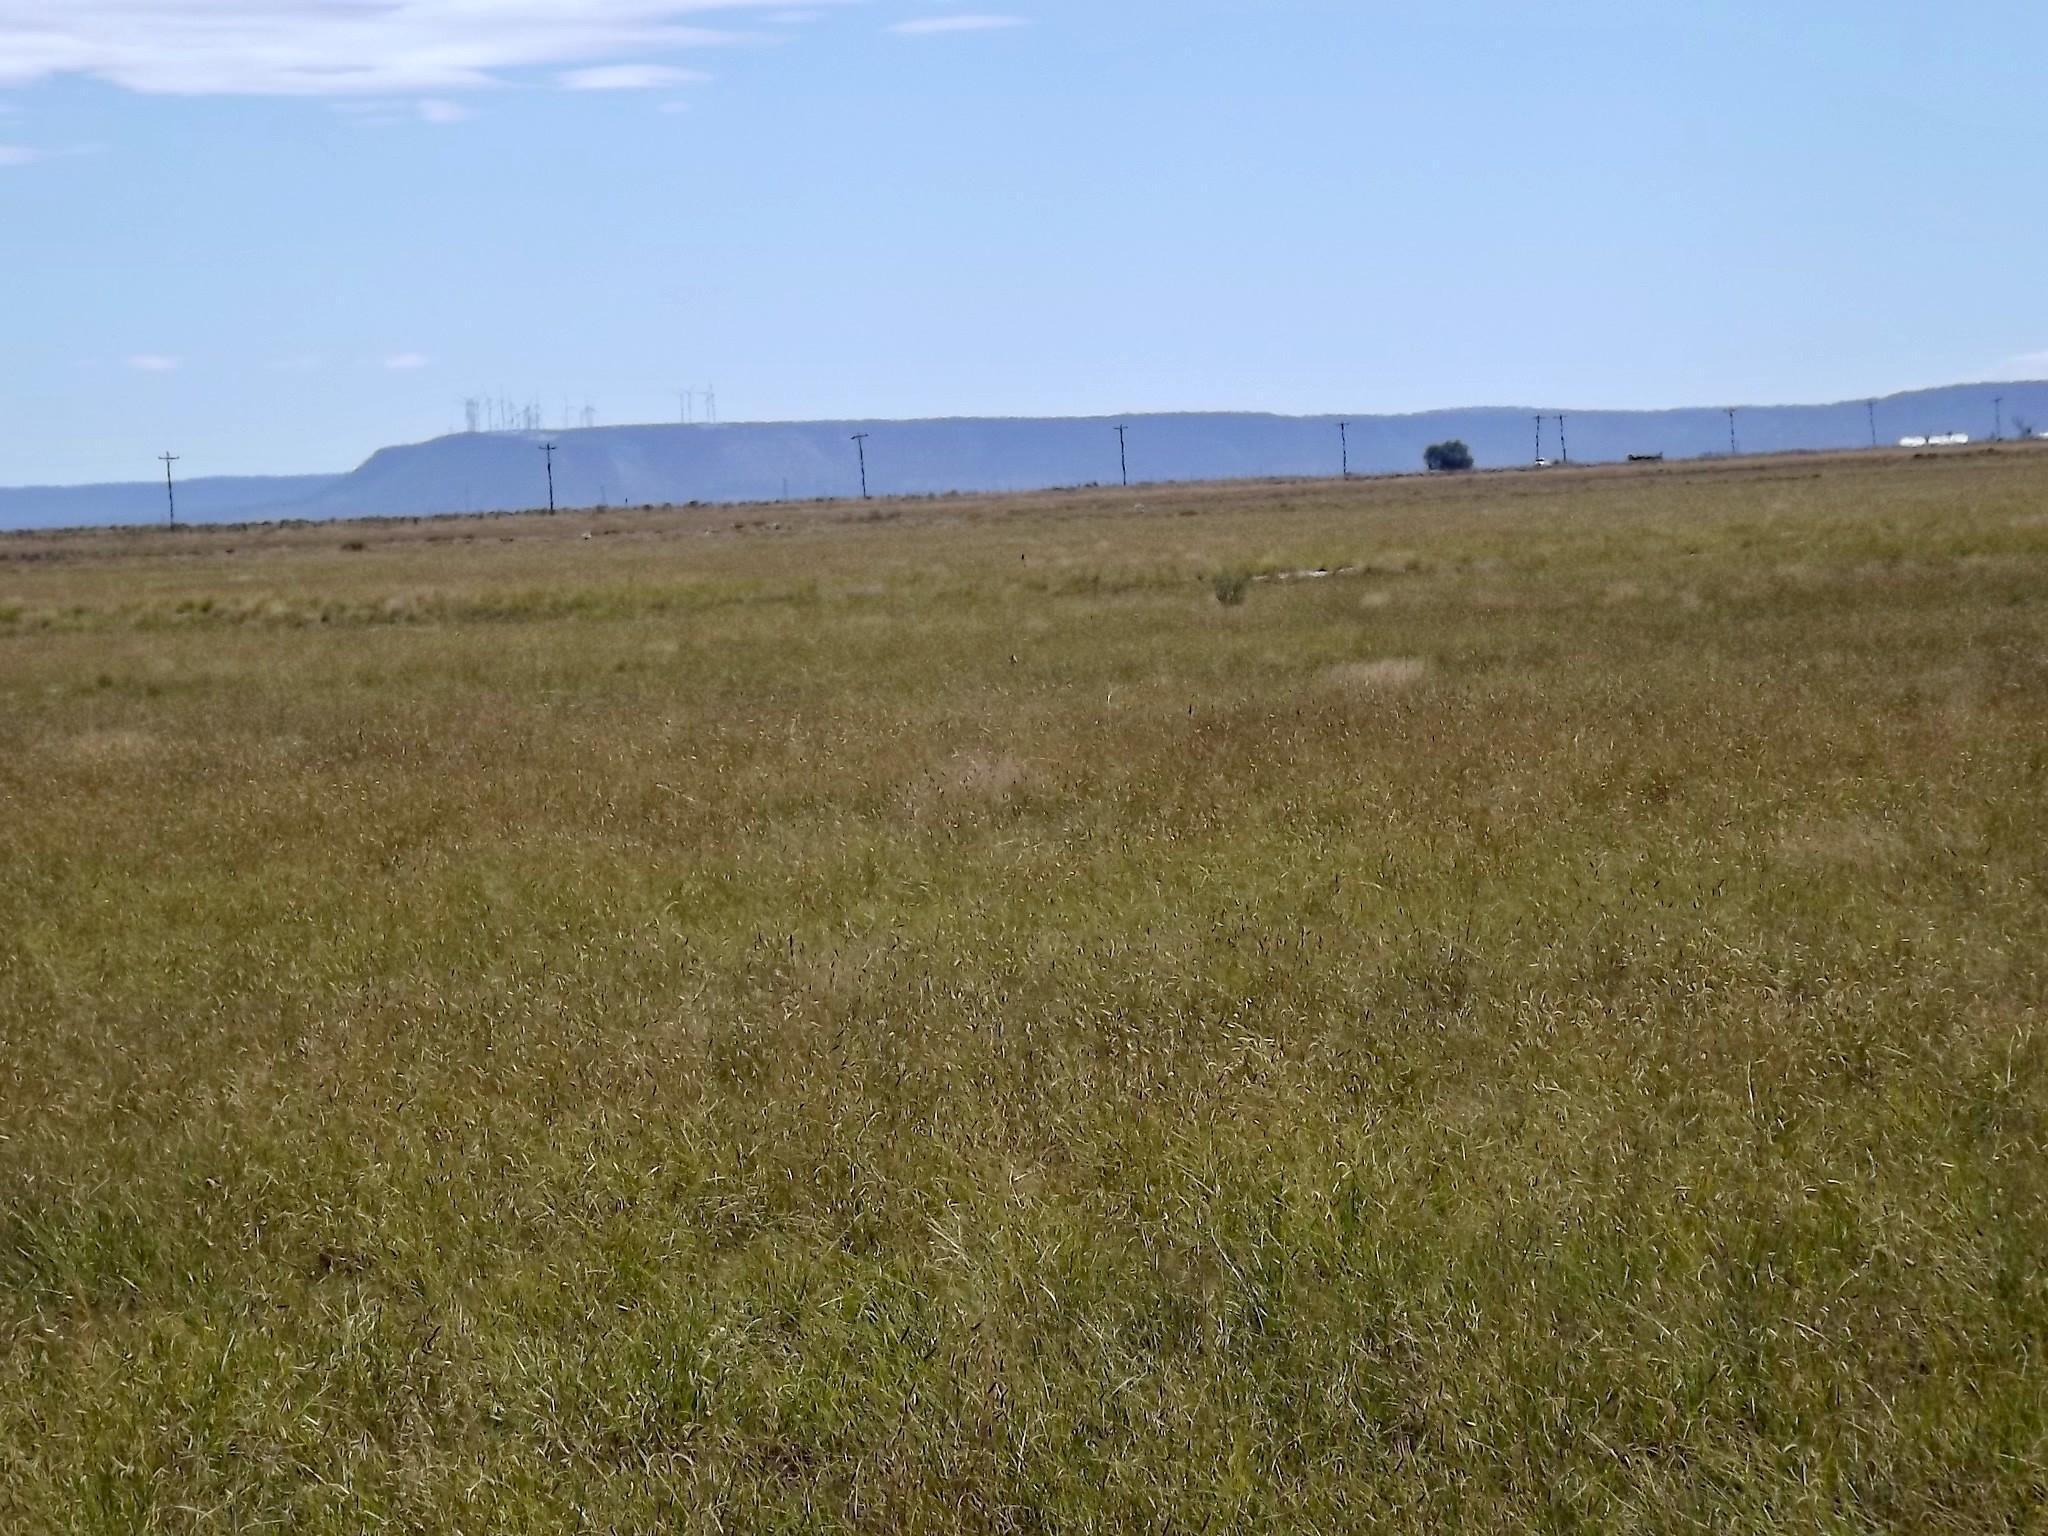 49 Corrie Drive, Estancia, NM 87016 - Estancia, NM real estate listing